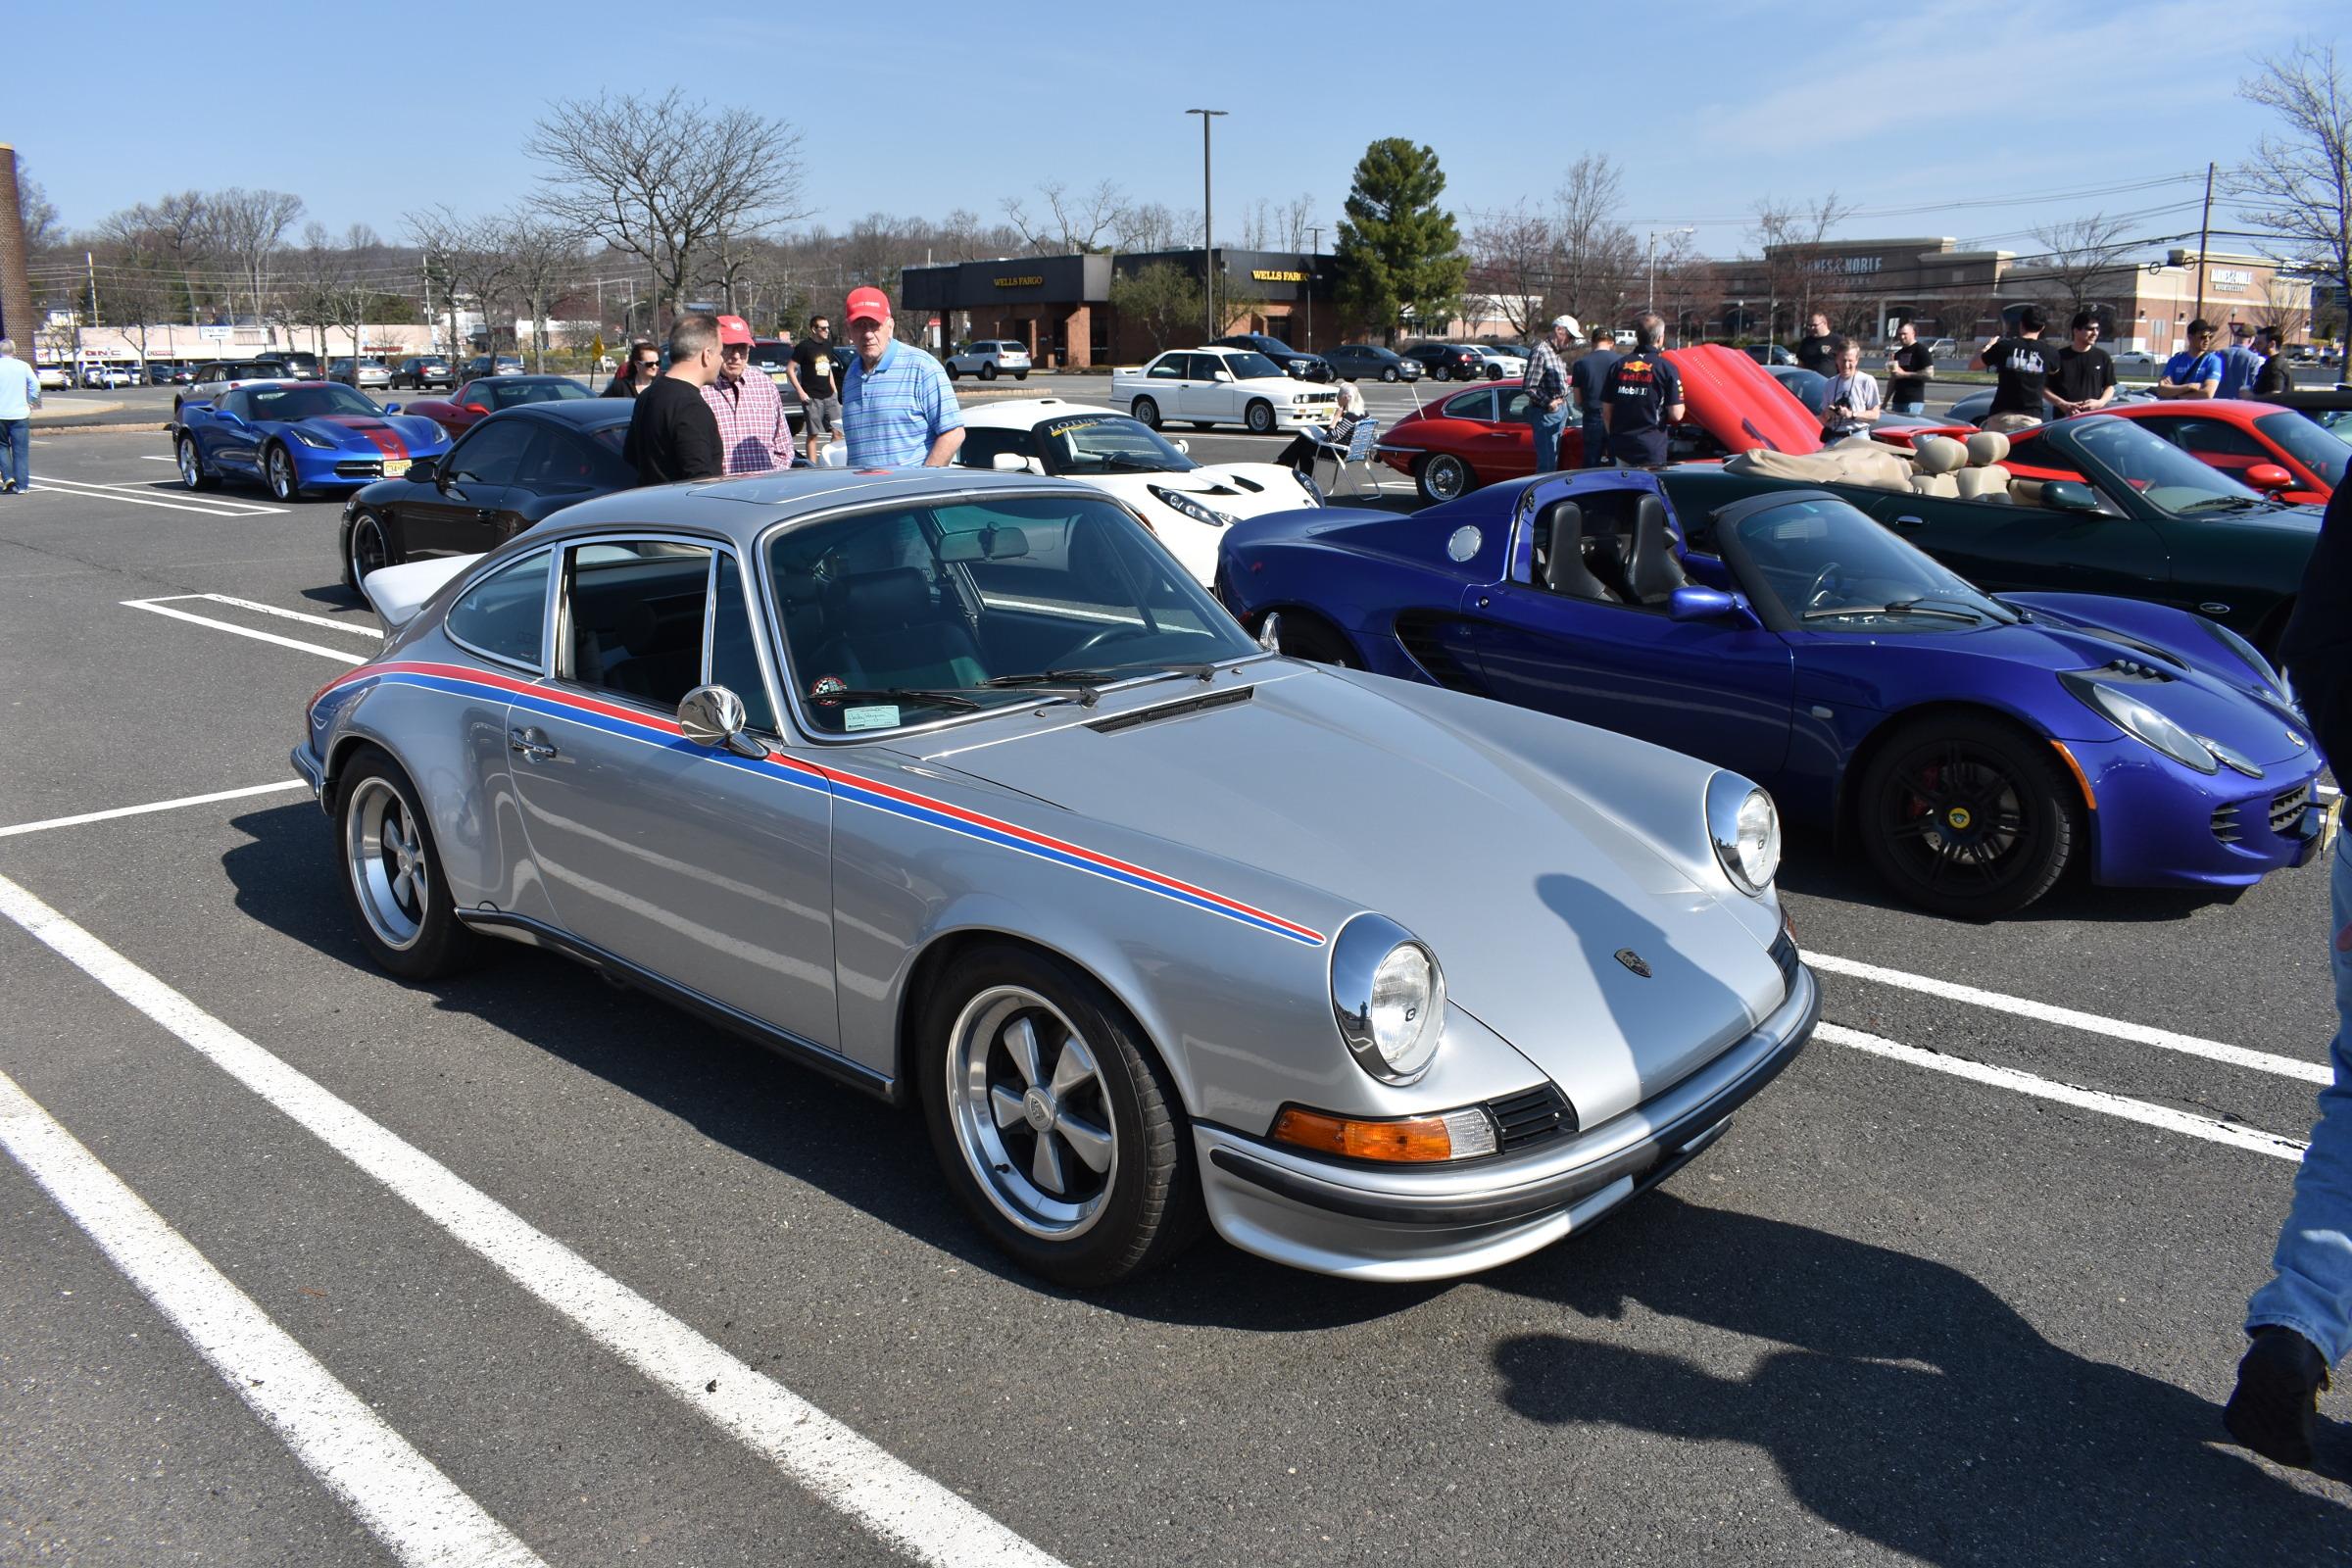 Cars Croissants Car Show Schedulenorthern New Jersey - Car show schedule